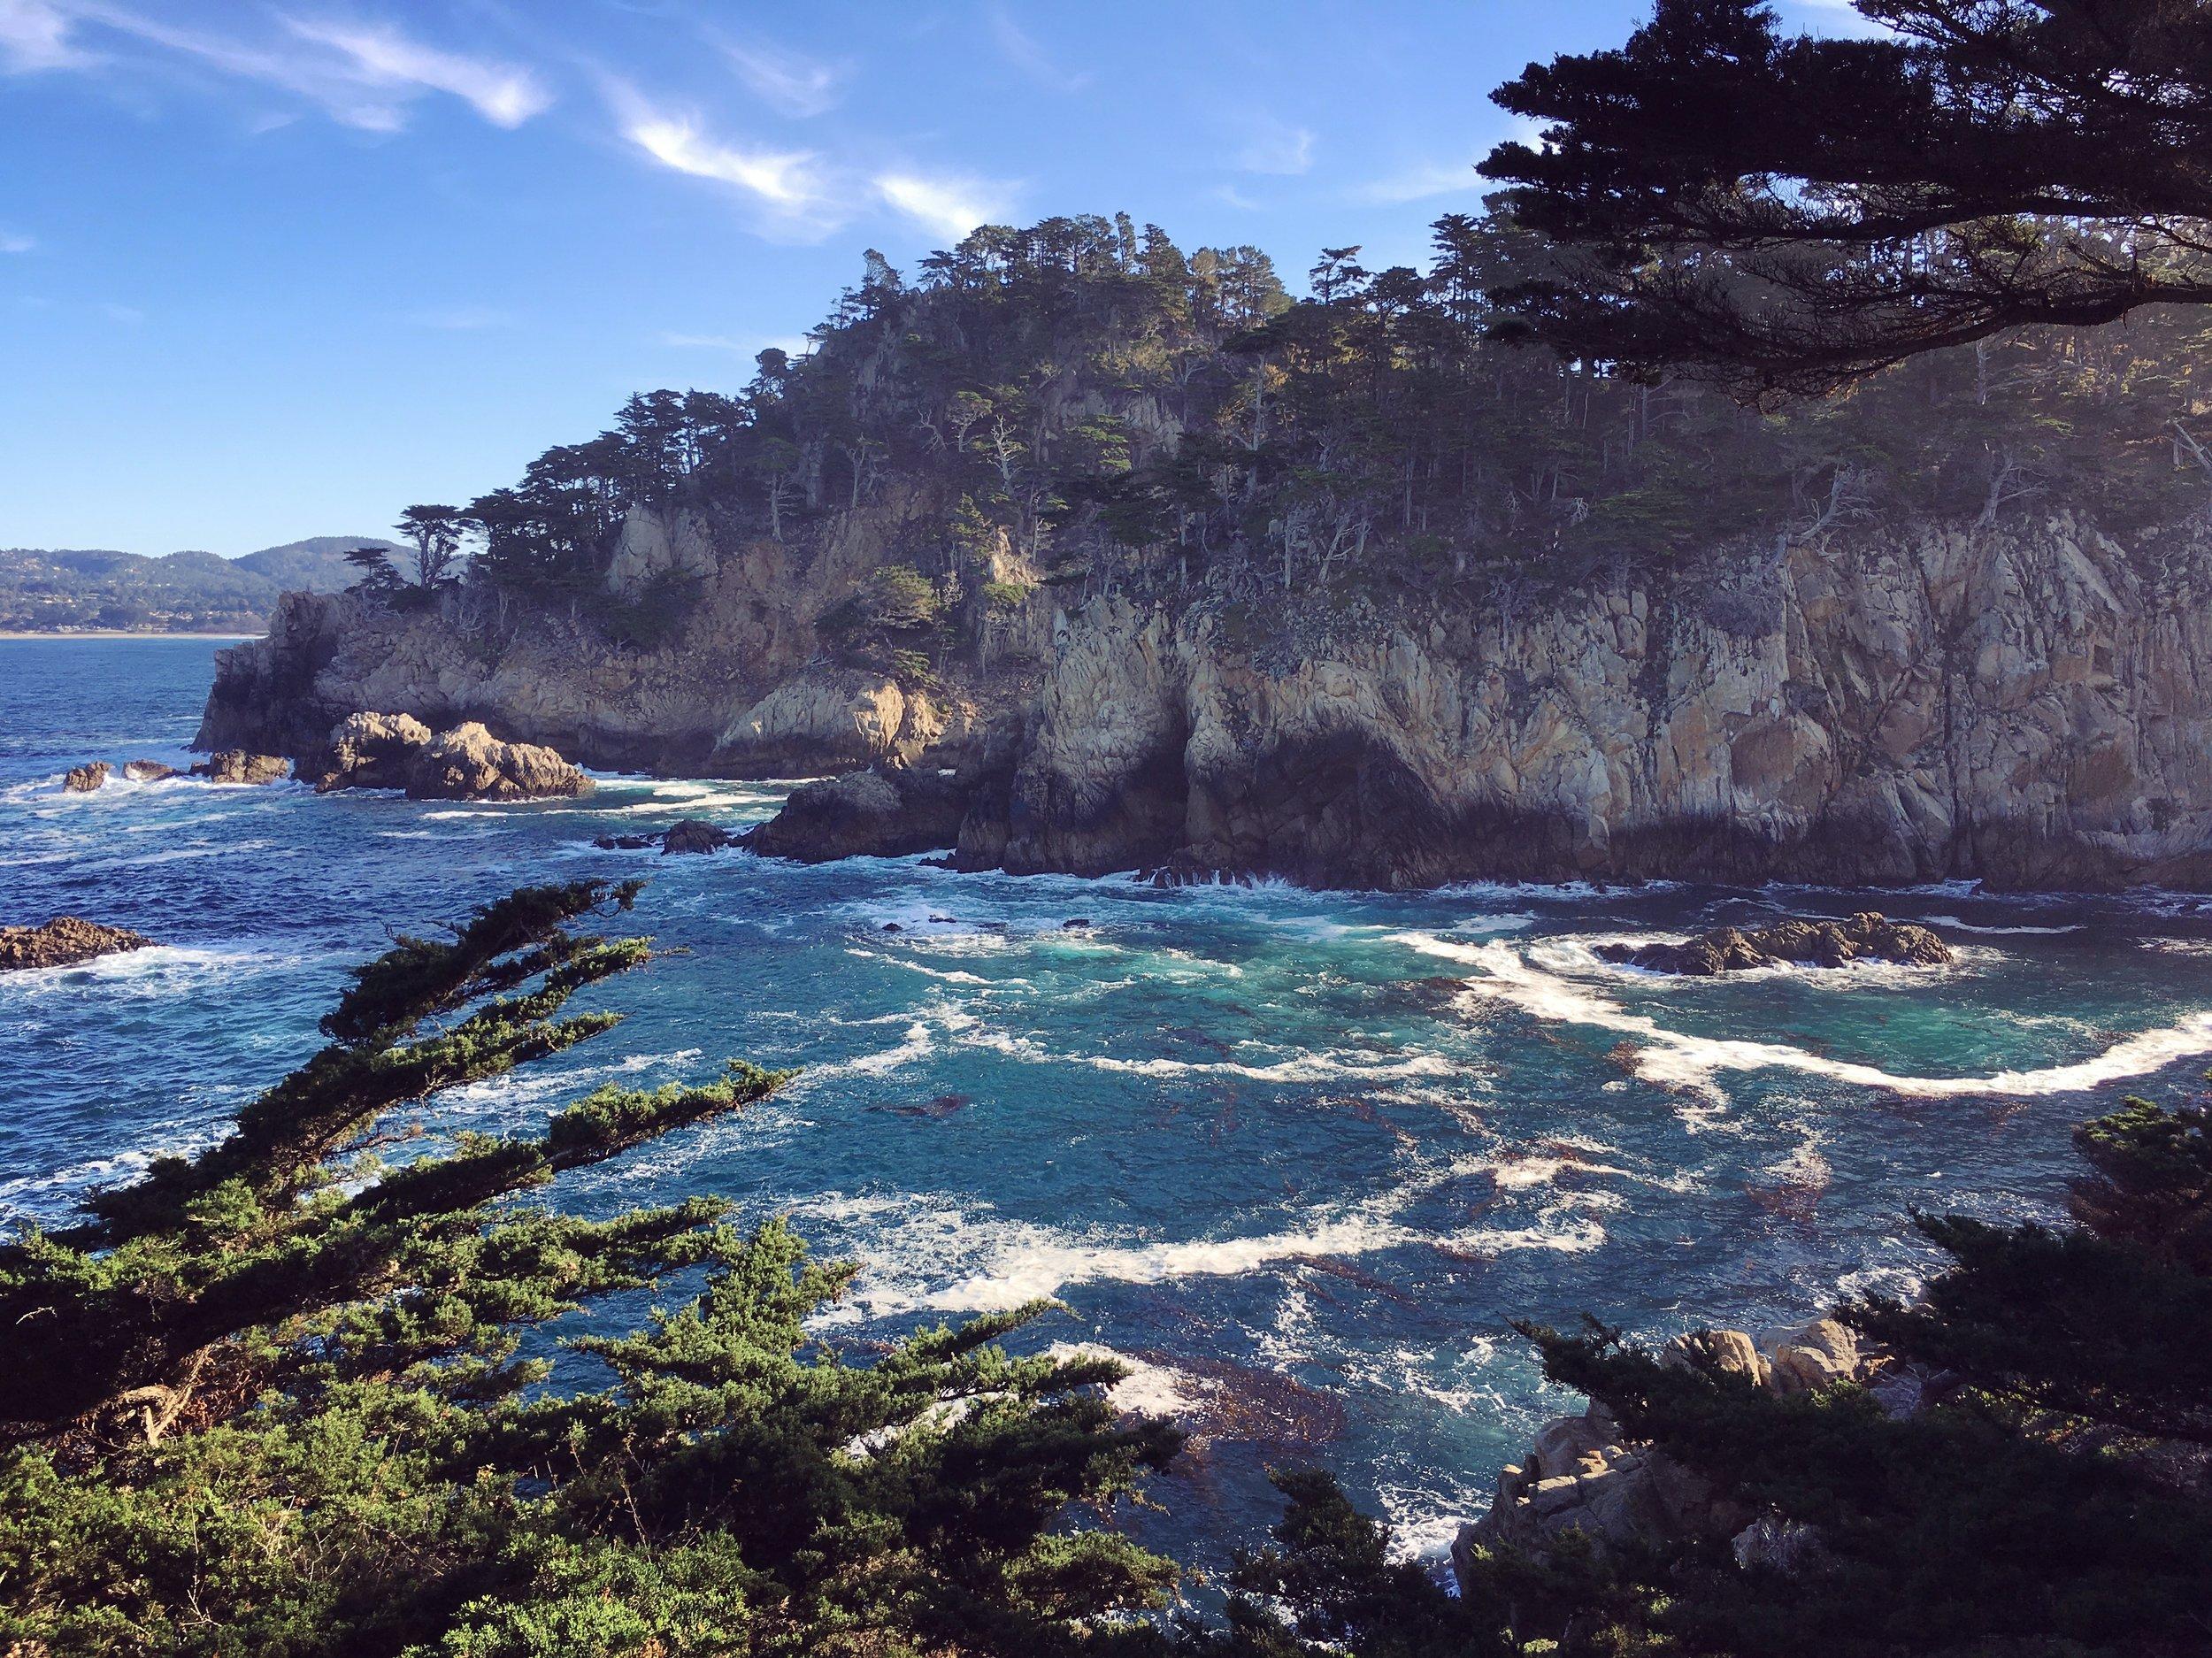 Crédit photo : Jaime Damak Point Lobos